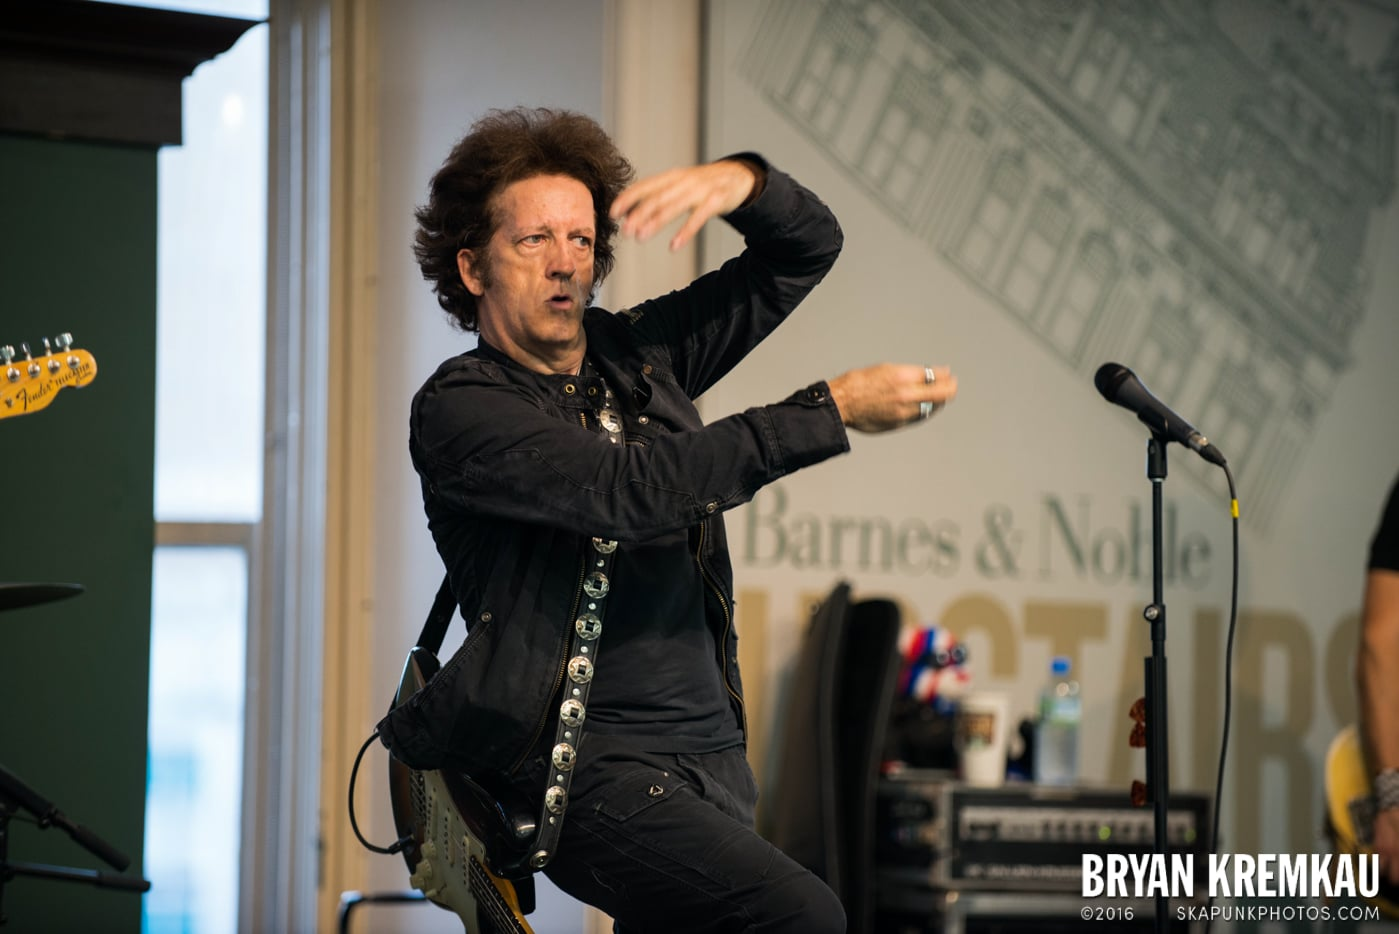 Willie Nile @ Barnes & Noble: Union Square, NYC - 6.25.13 (8)